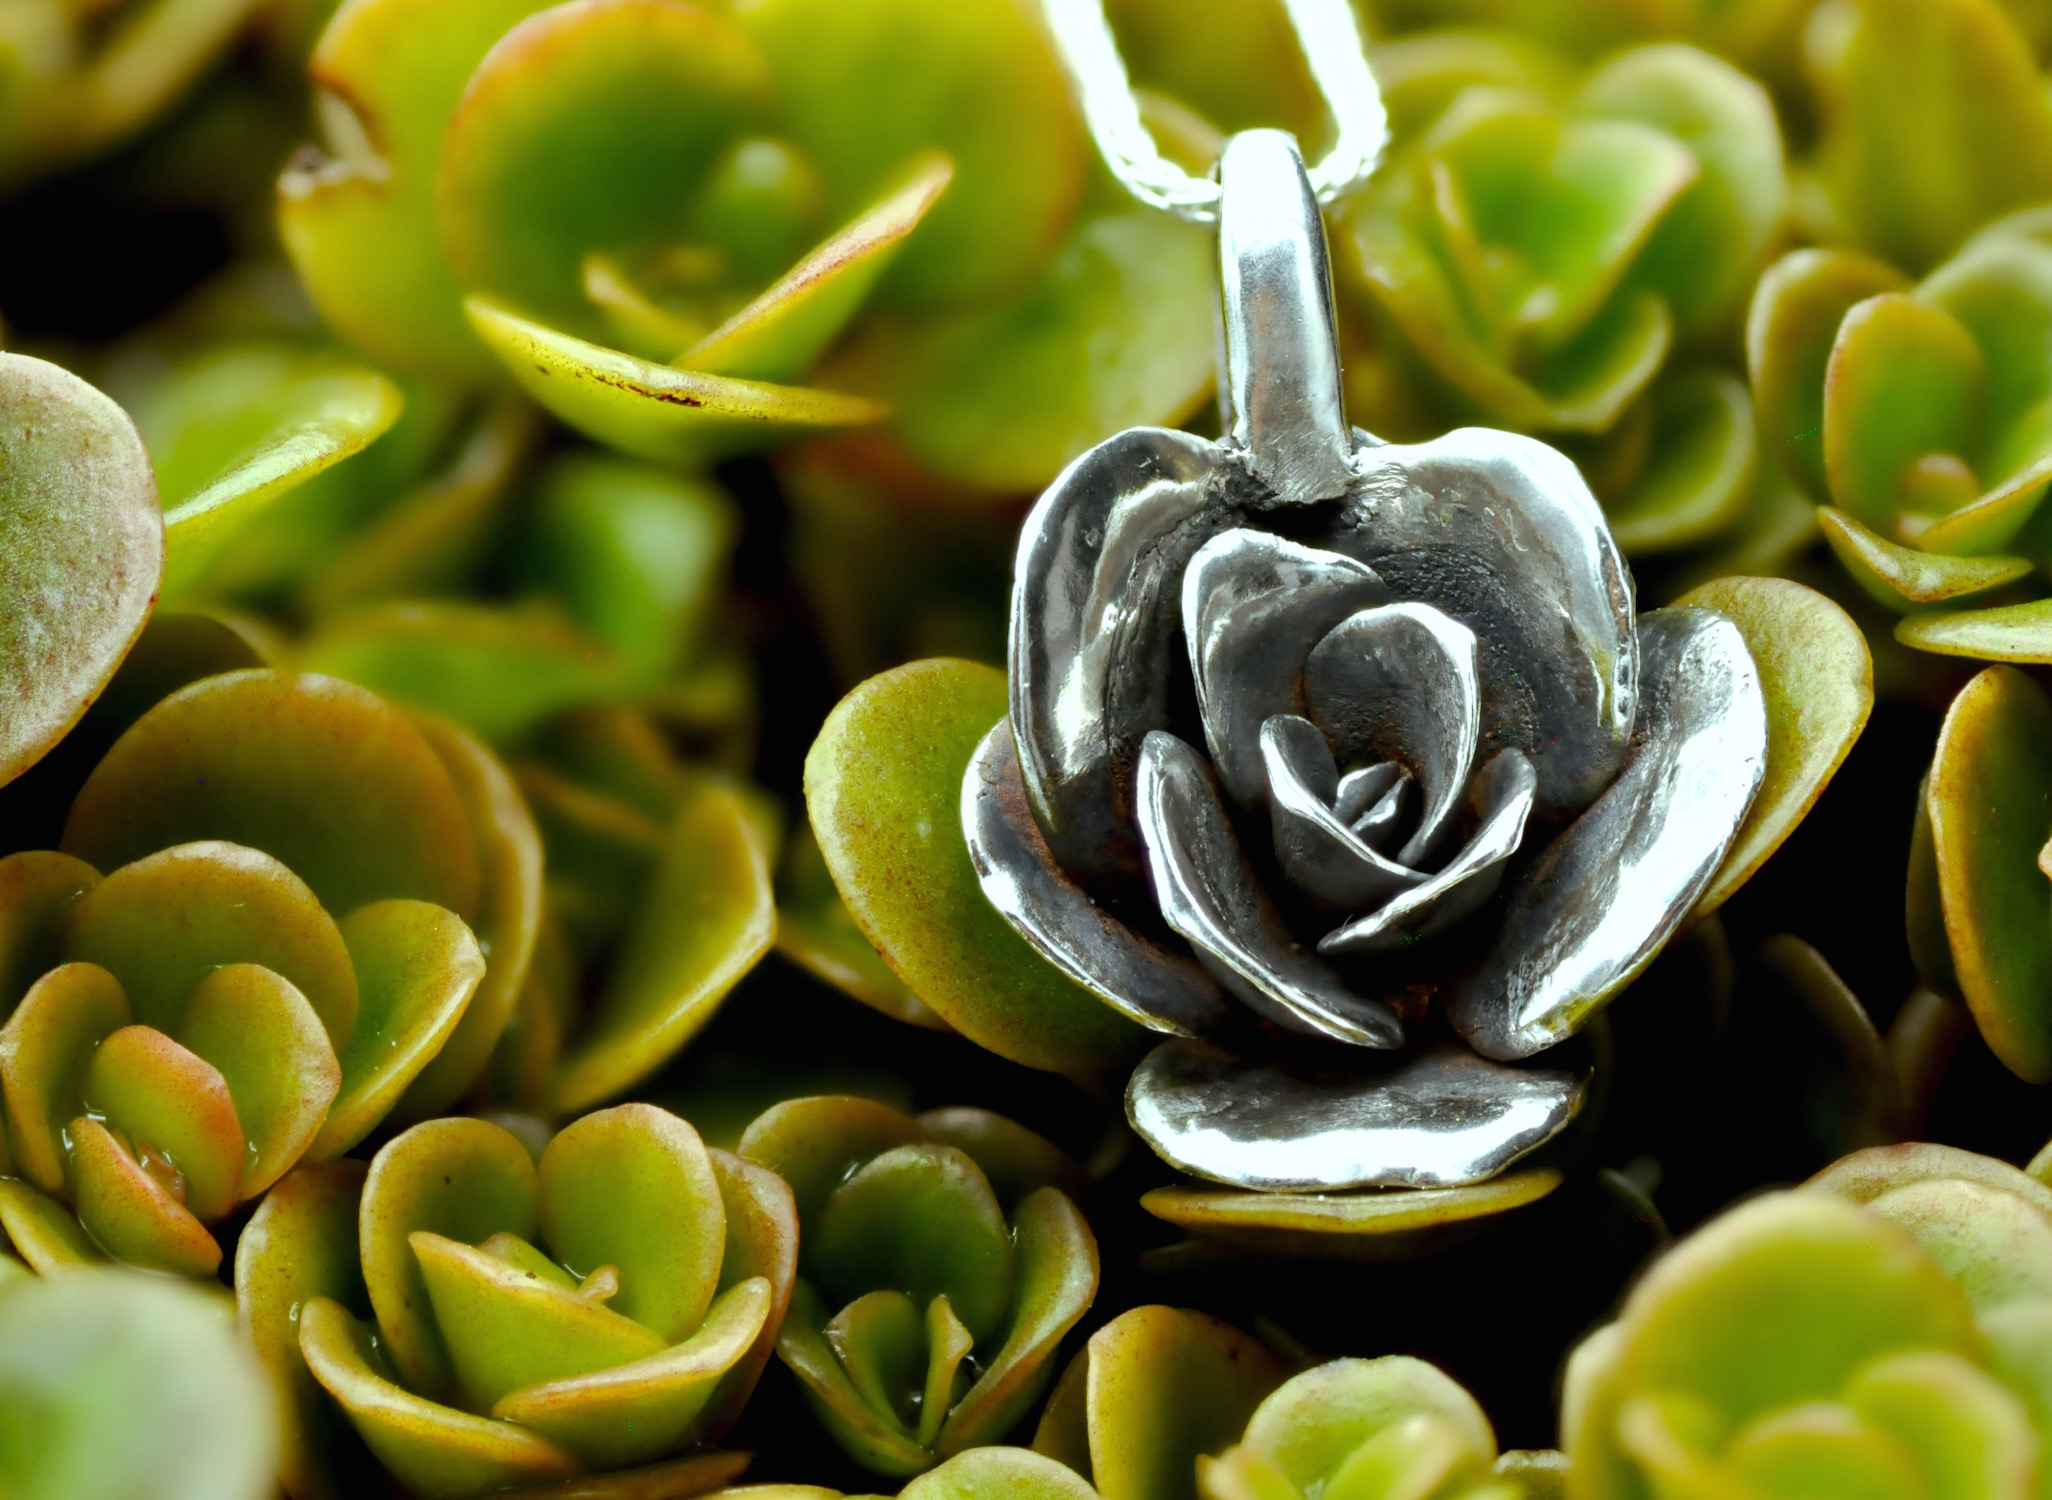 limelight-sedum-necklace-medium-silver-with-plant - 2.jpg